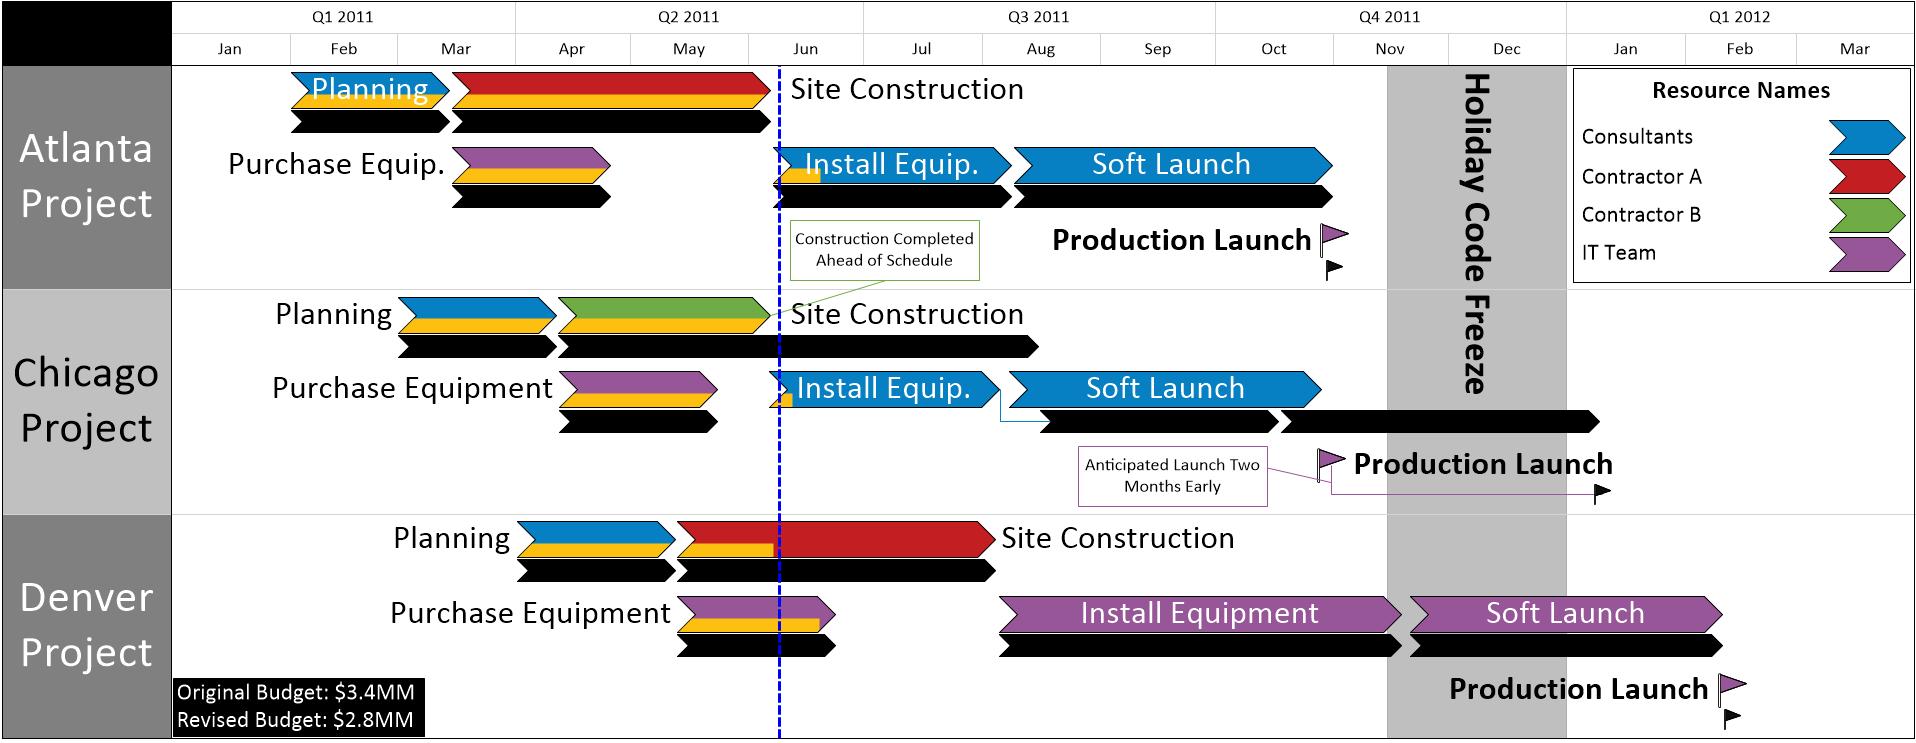 windows 8.1 features pdf